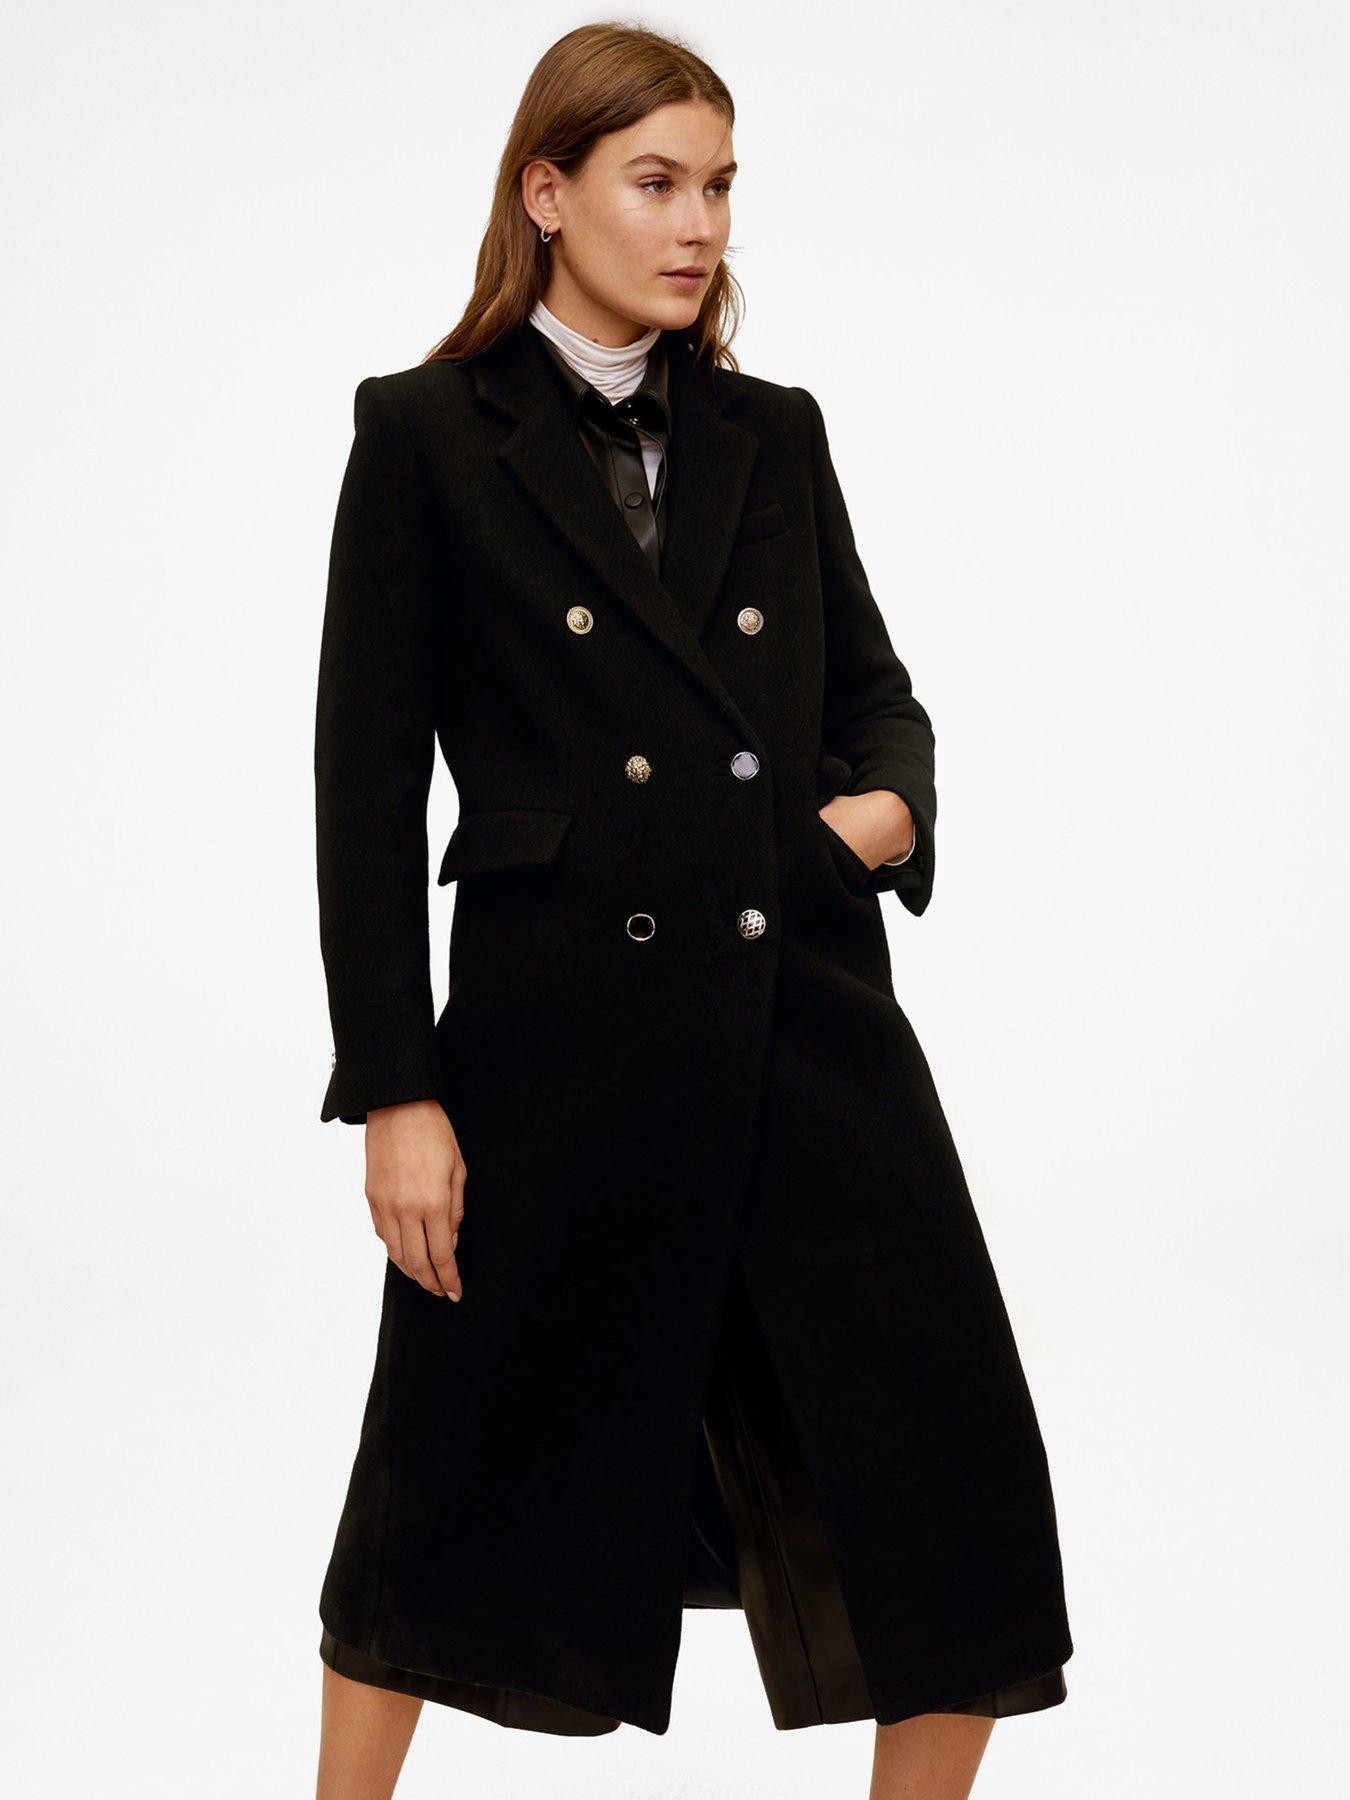 9 Best MANGO COATS images | mango coats, coats for women, coat